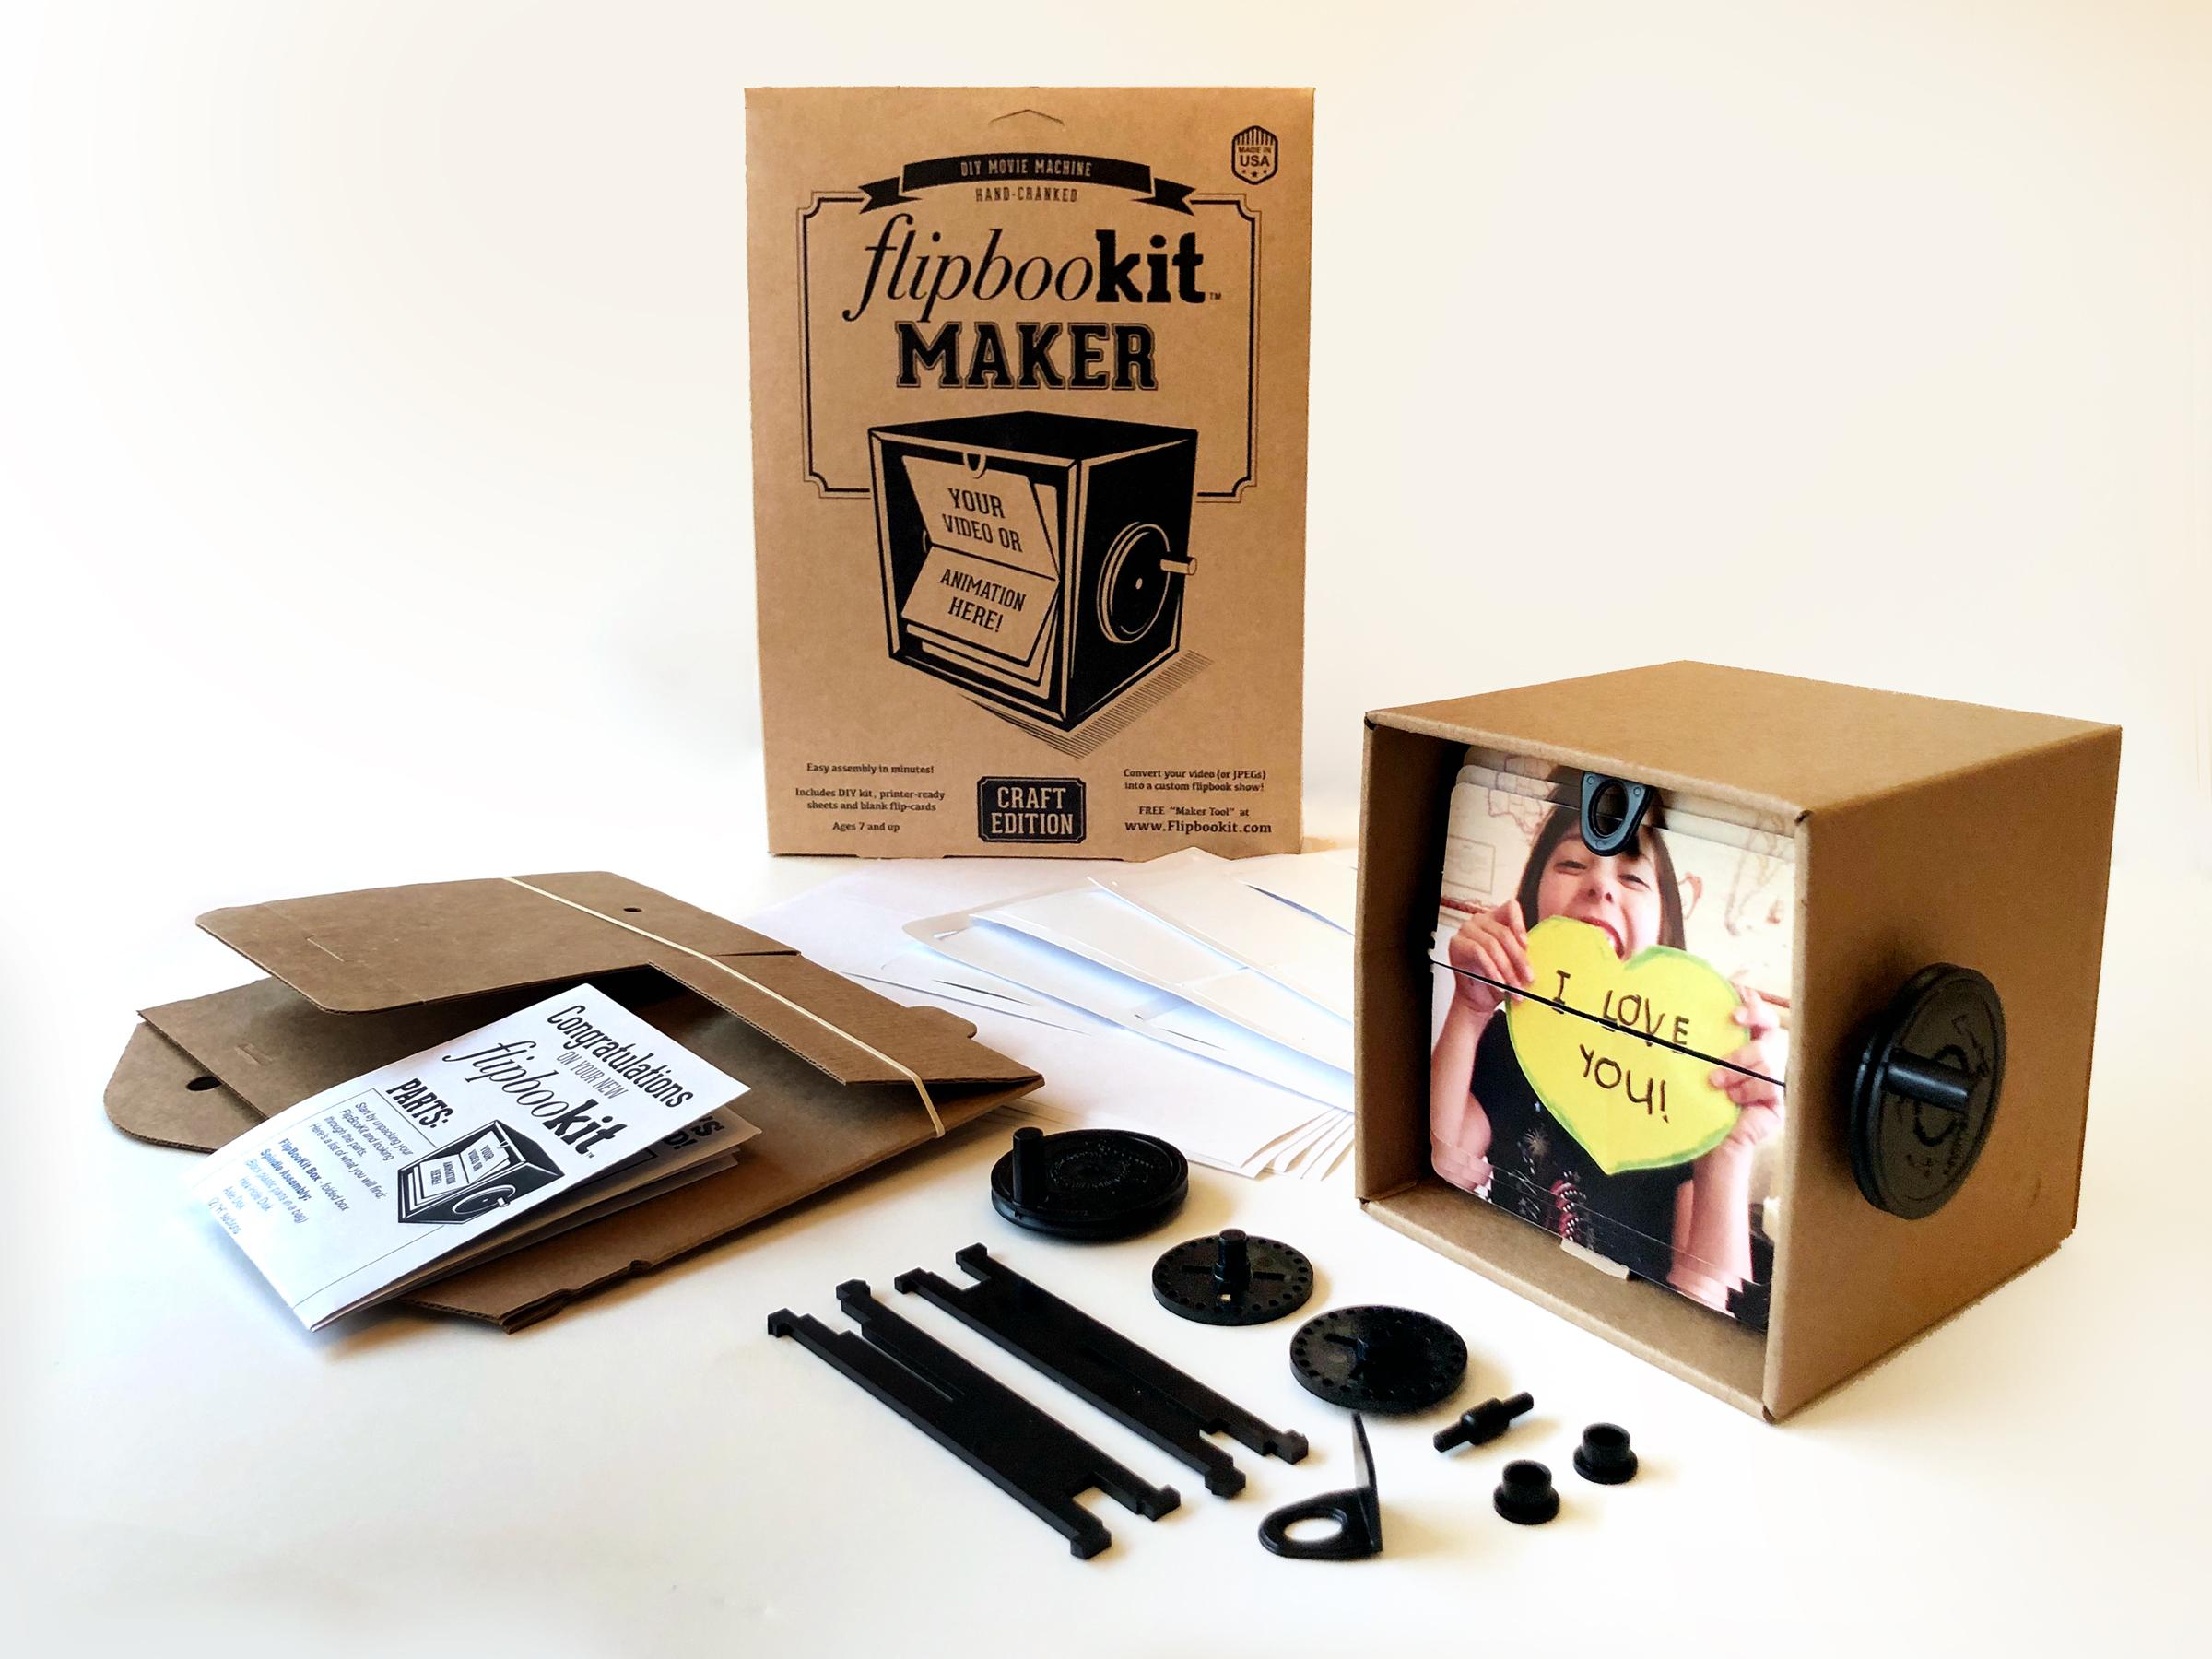 Flipbookit Maker Kit Craft Make Your Own Flip Book Animation Machine